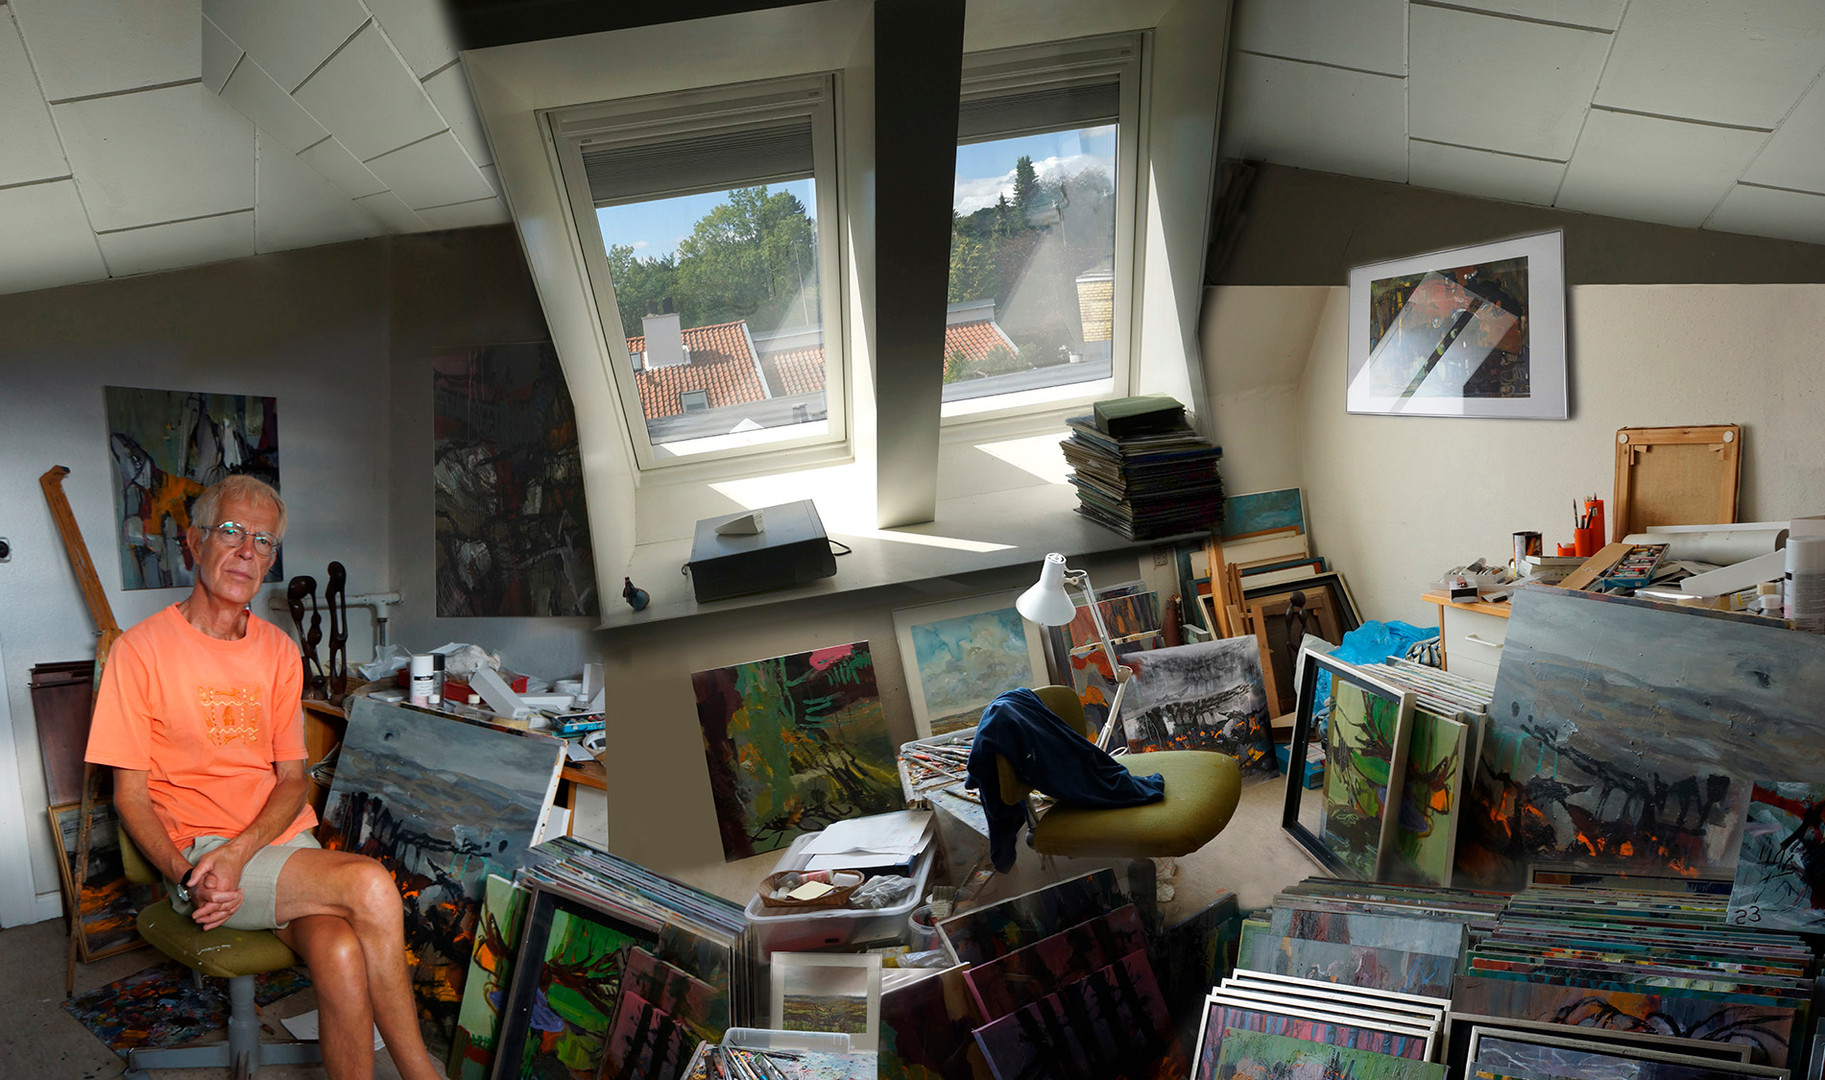 In Esben's Studio